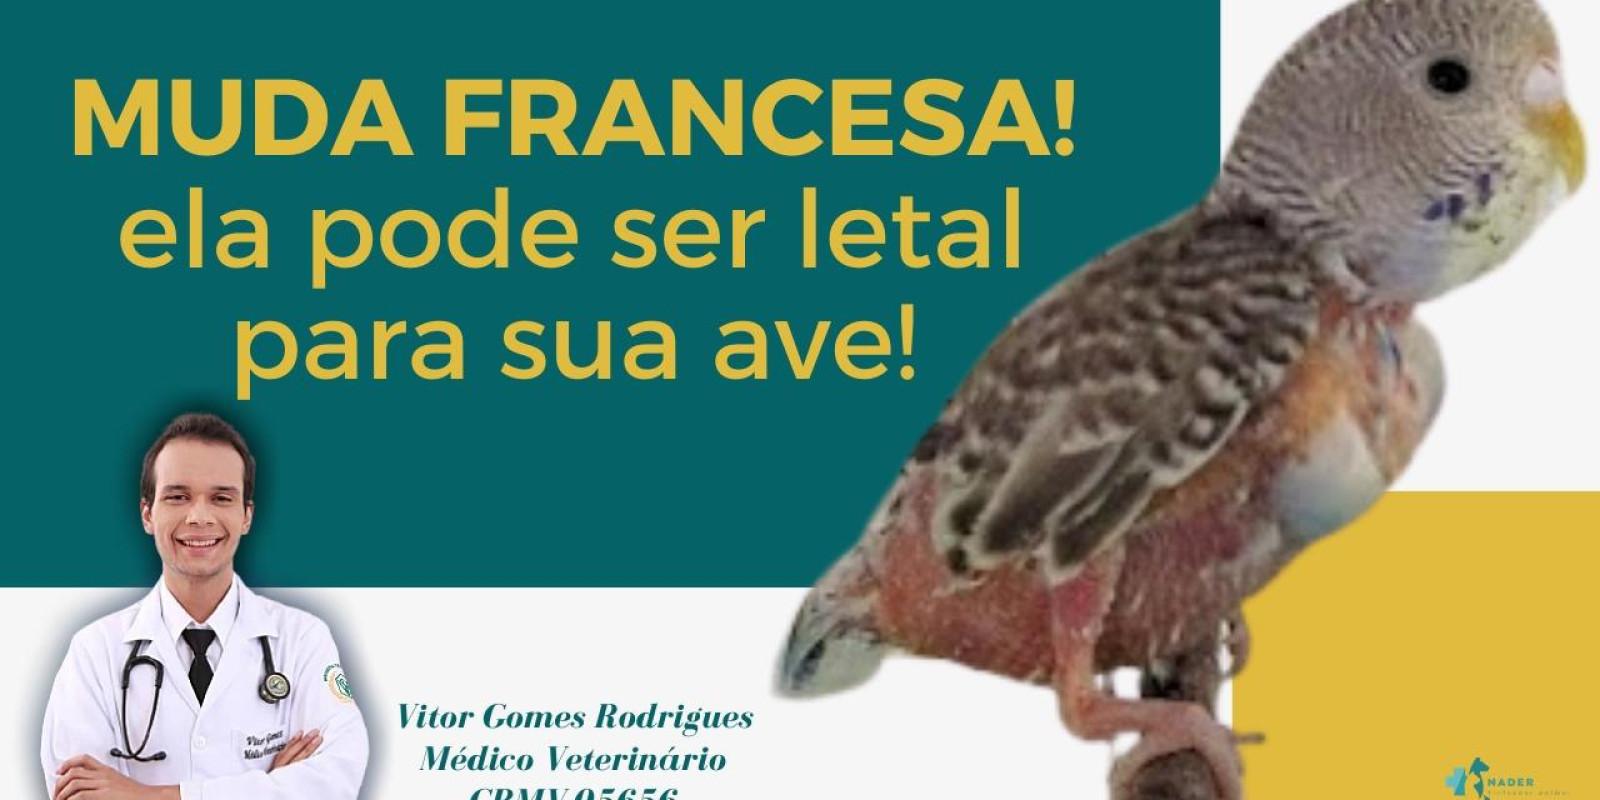 Queda de penas da sua ave pode ser sinal de muda-francesa e pode matar!